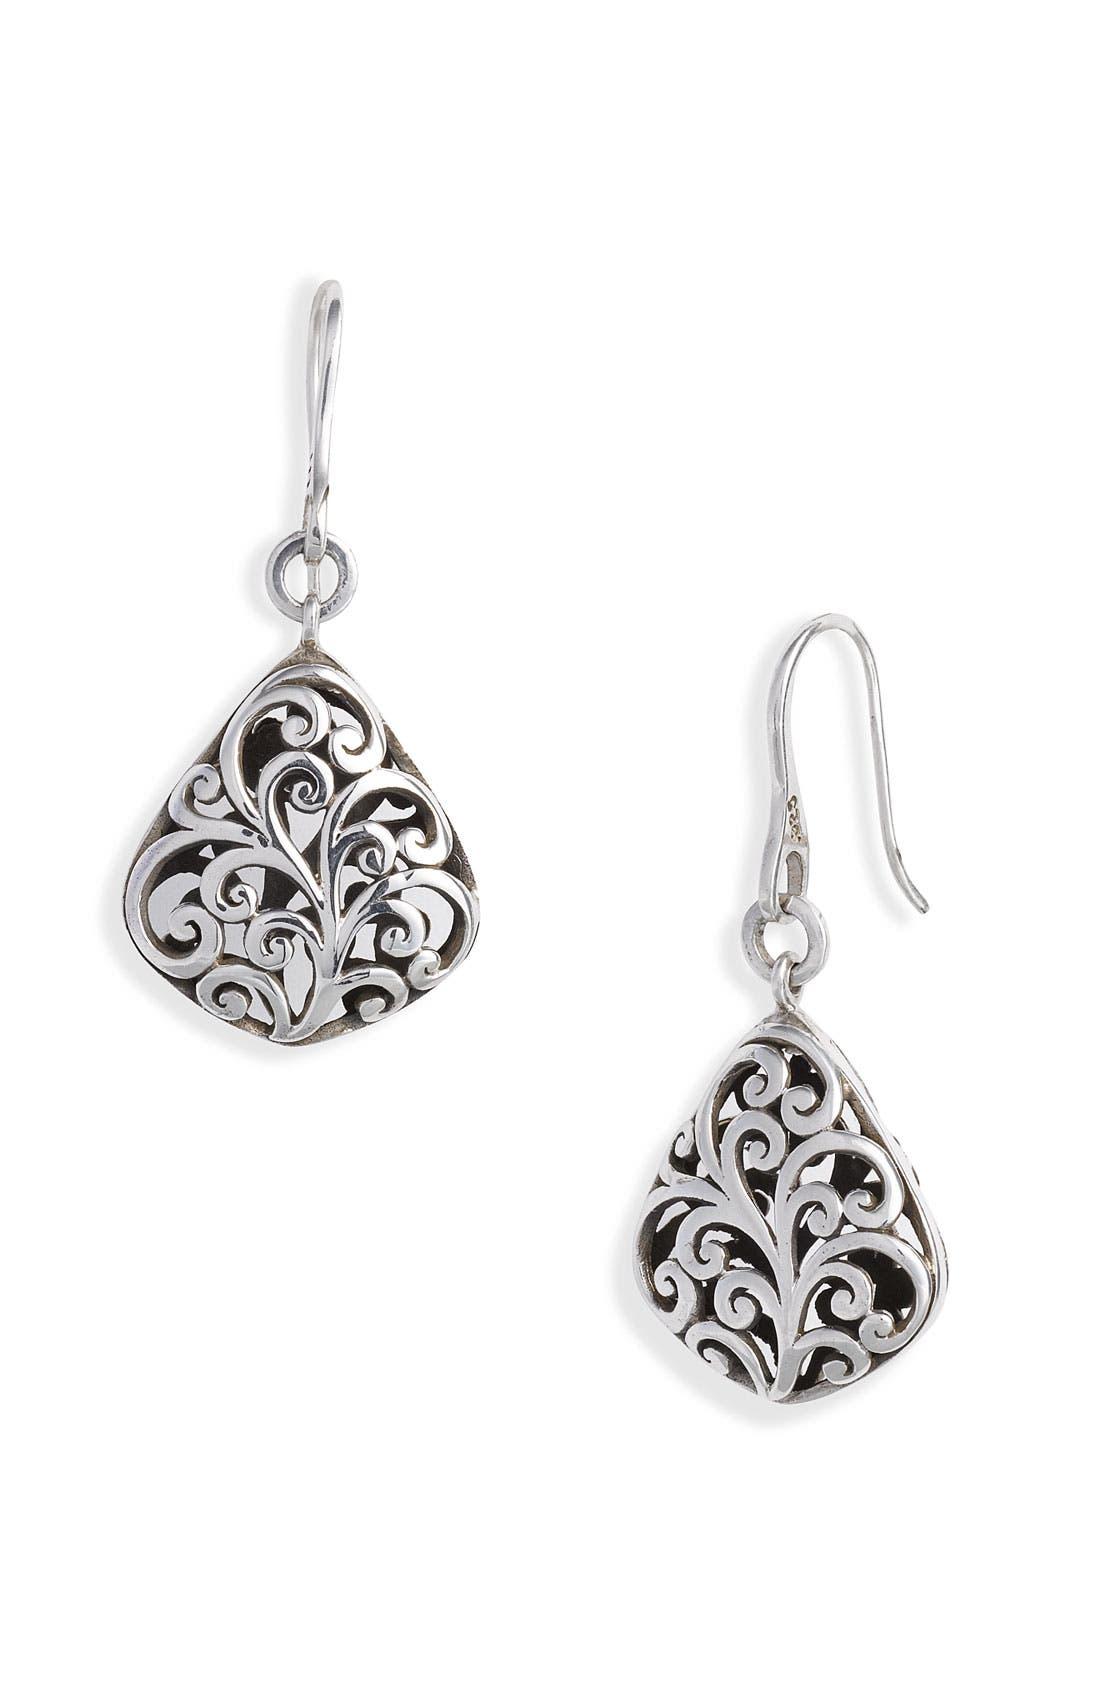 Main Image - Lois Hill 'Cage' Diamond Shape Drop Earrings